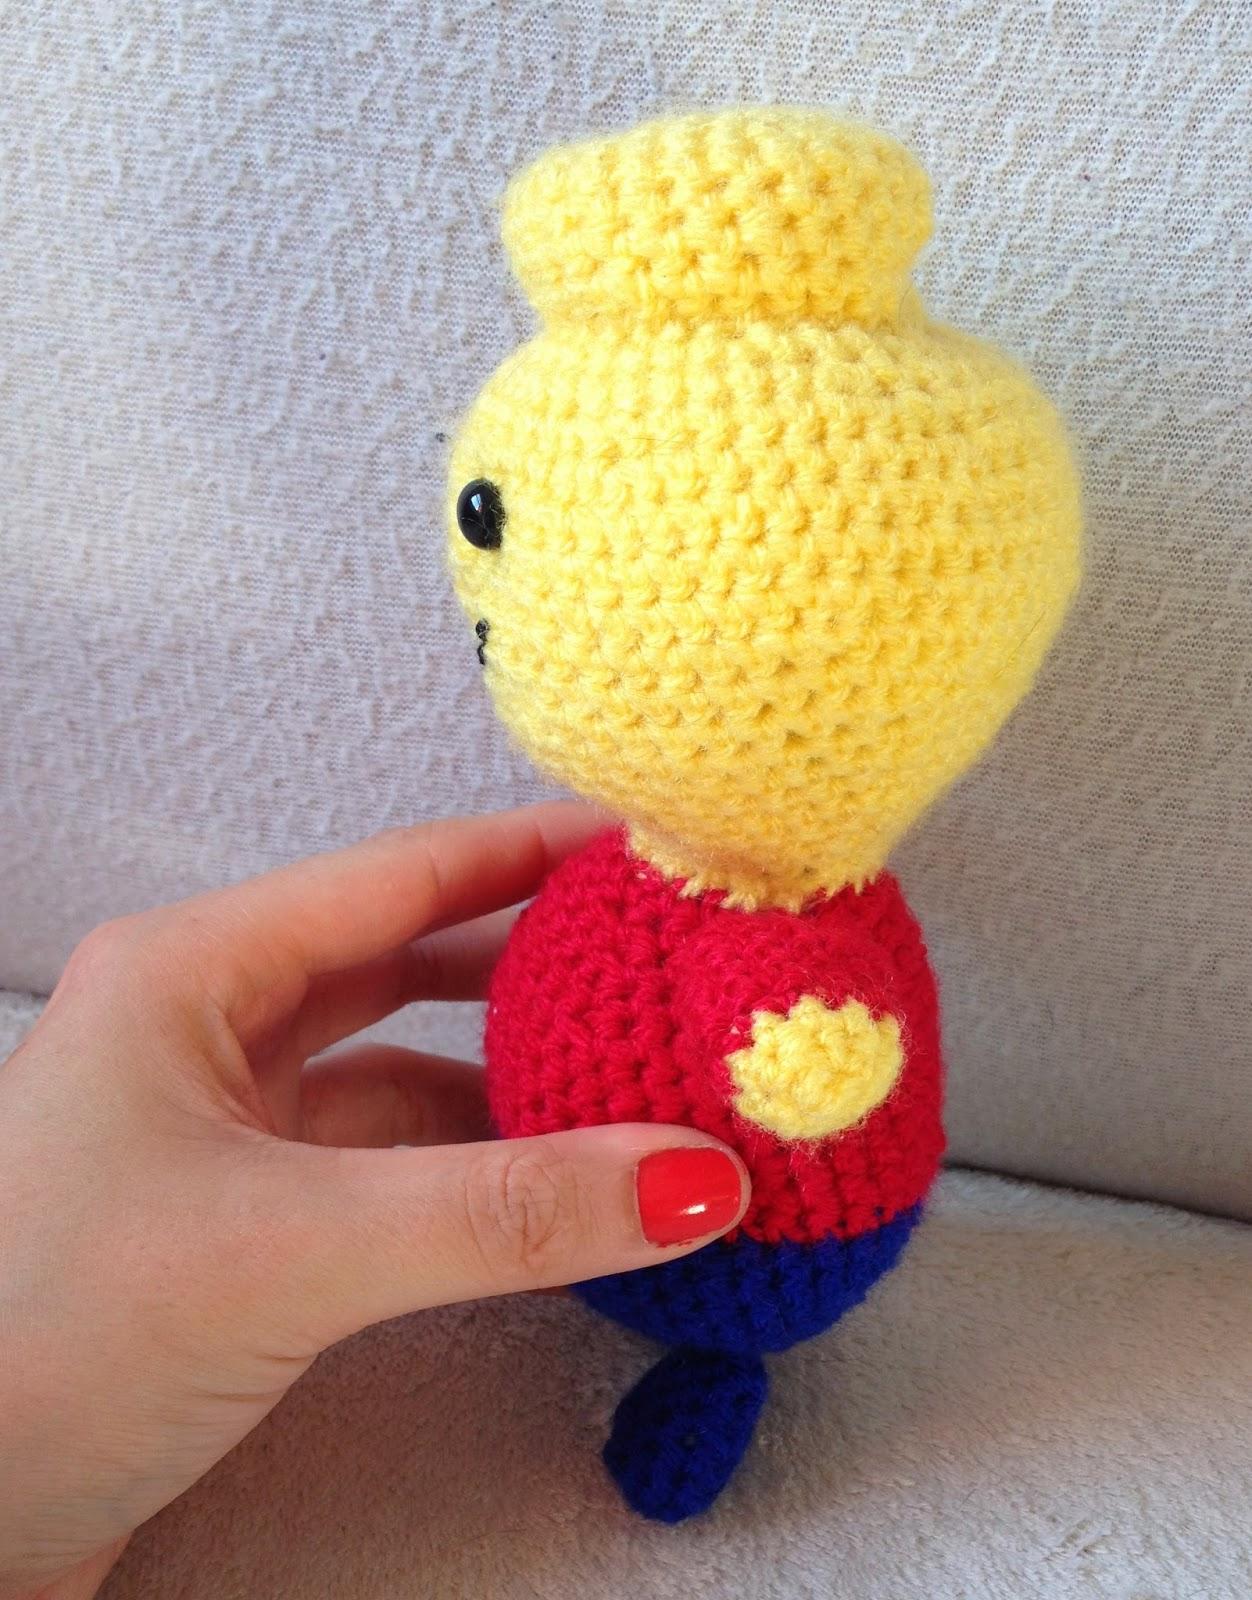 Amigurumi Lego Man : The Perfect Hiding Place: Crochet Amigurumi Lego Man ...